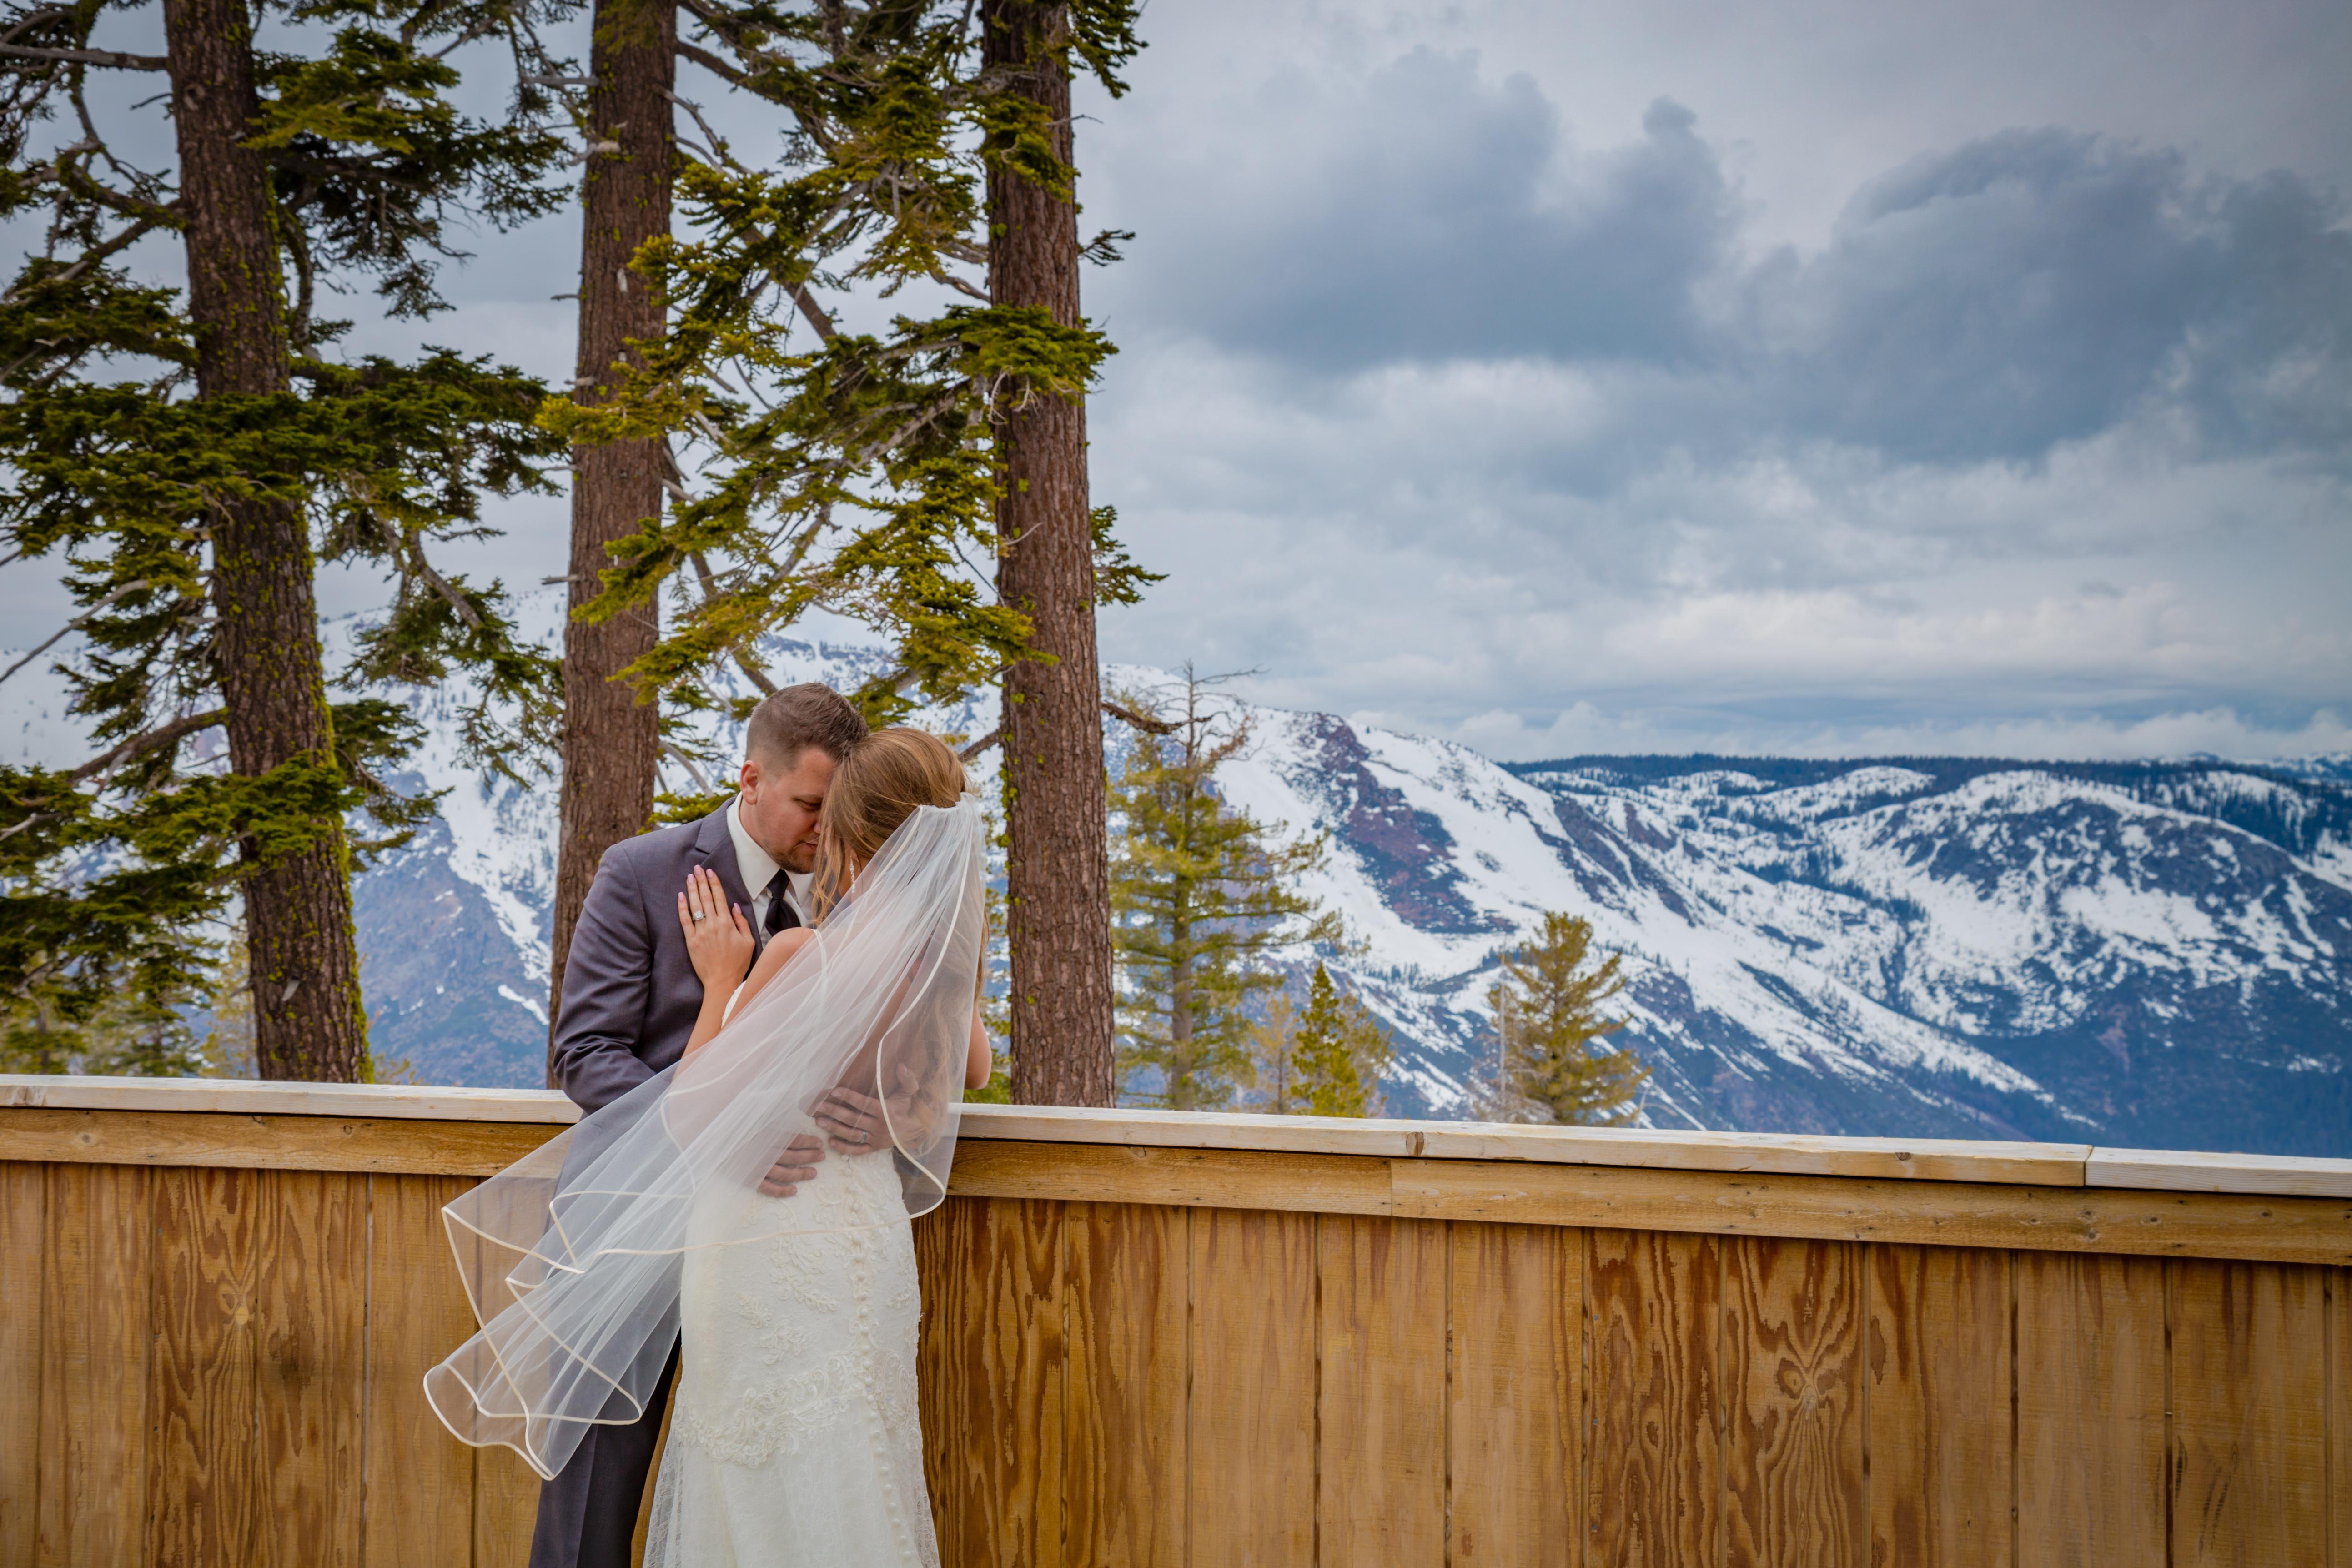 bear valley wedding gallery - bear valley